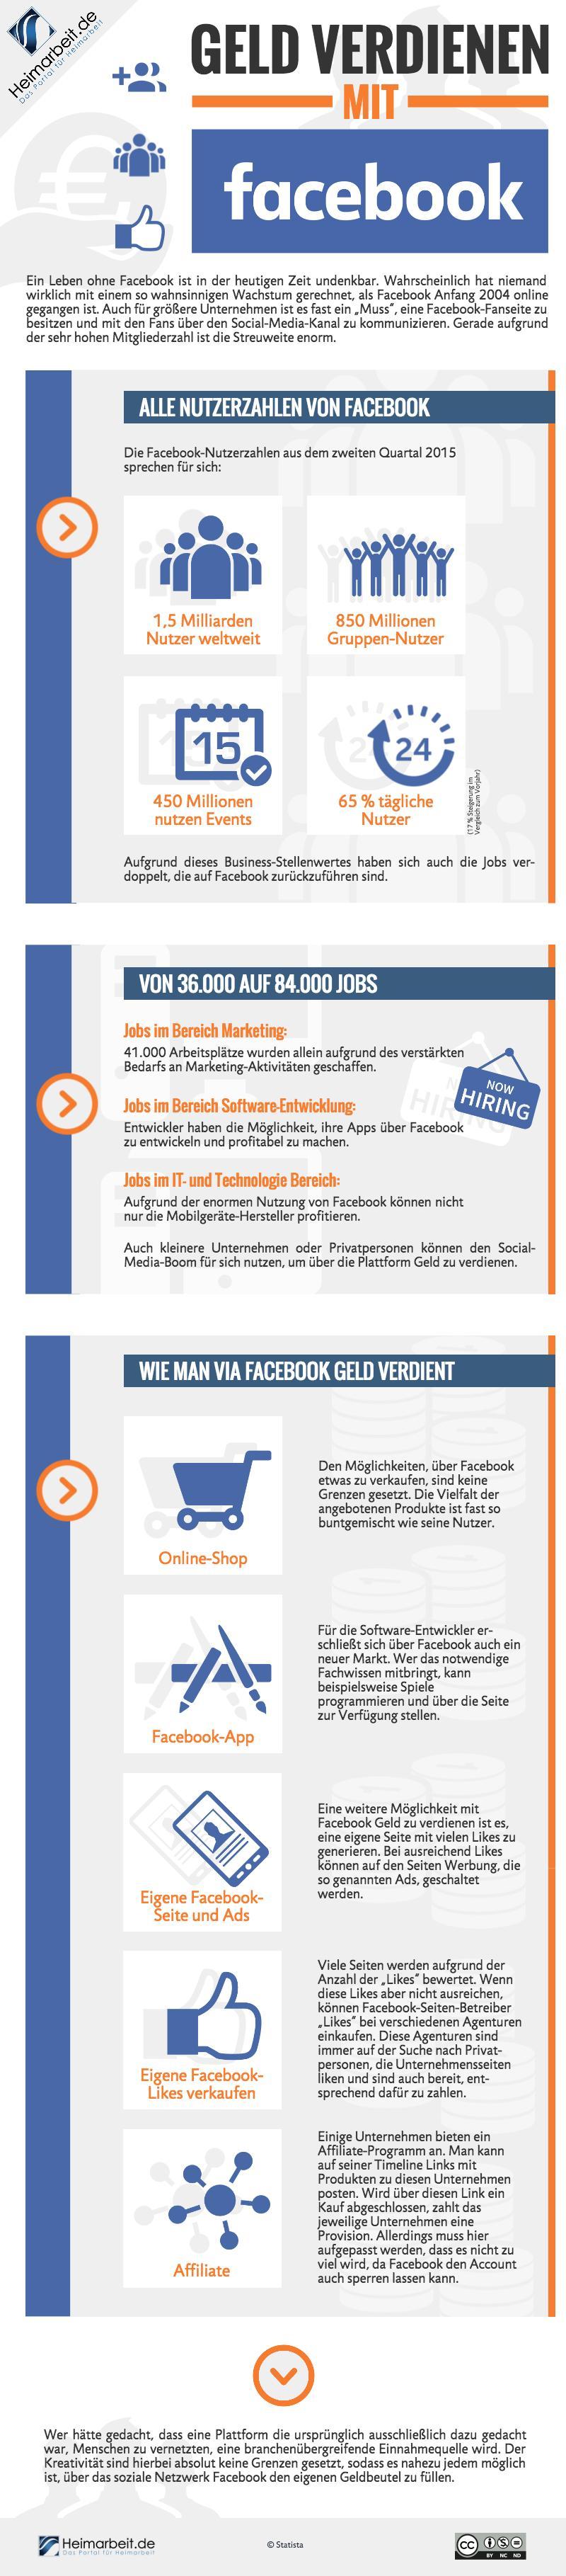 Geld verdienen mit Facebook